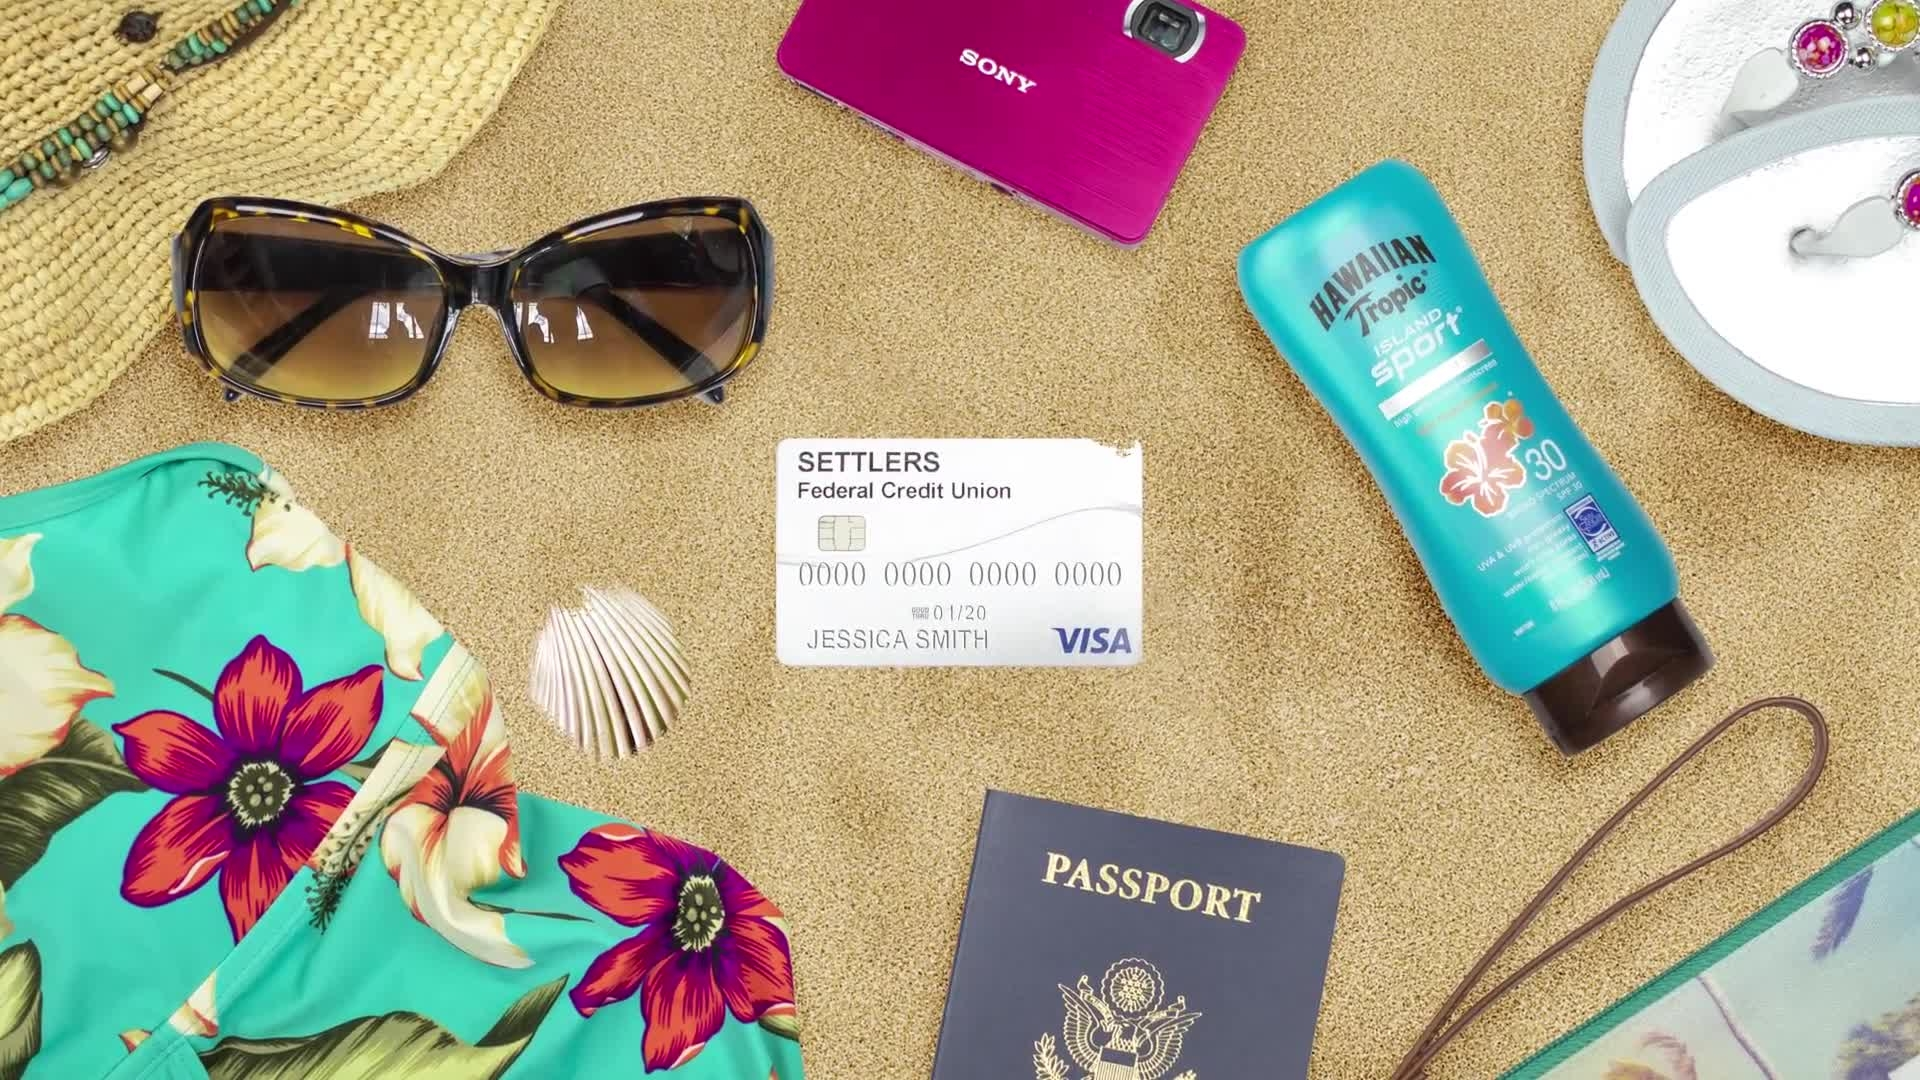 Settlers Credit Union Visa Vacation